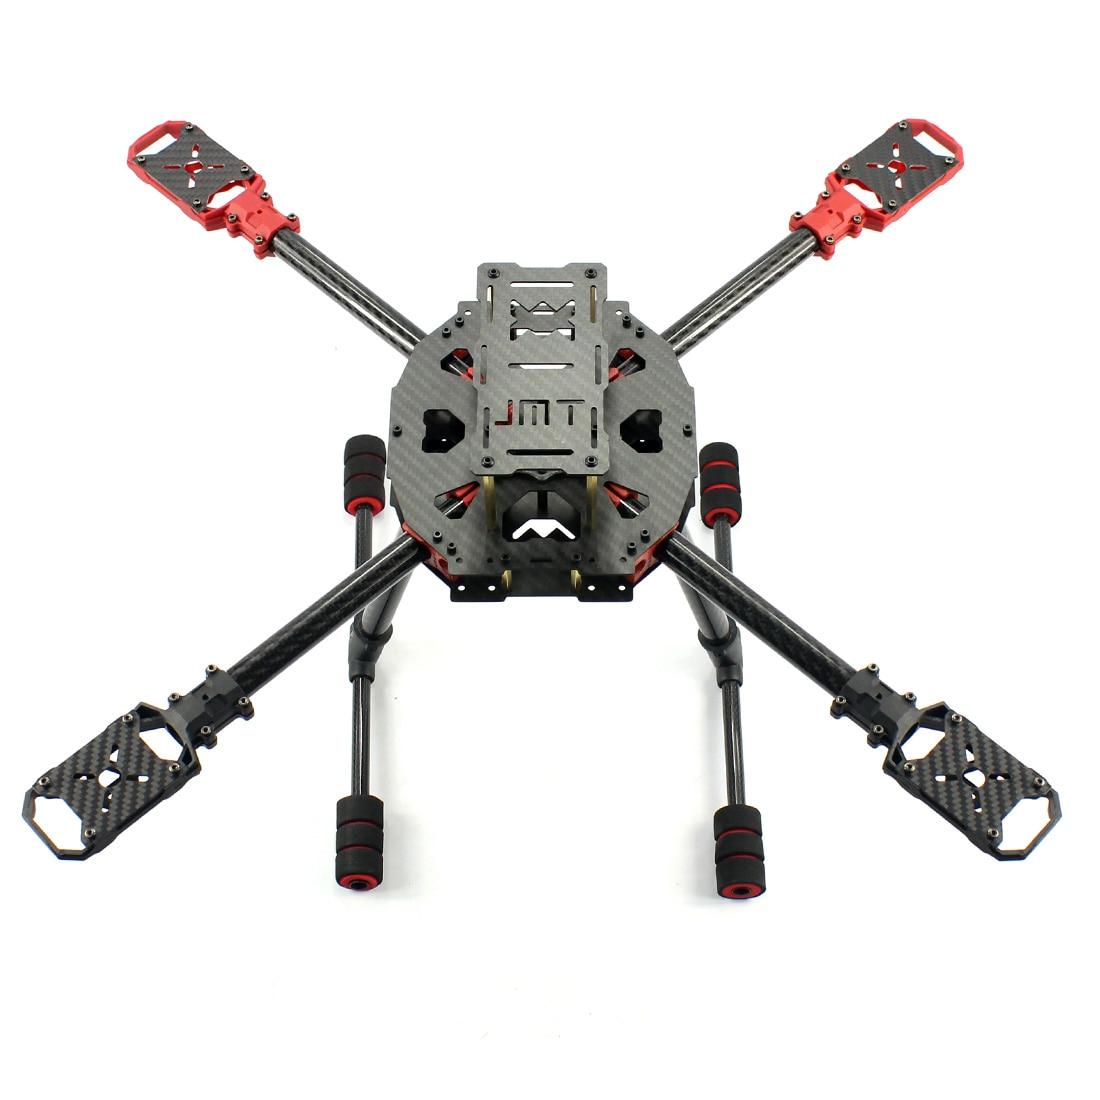 JMT J630 630mm Carbon Fiber 4 axis Foldable Rack Frame Kit High Landing Skid for DIY